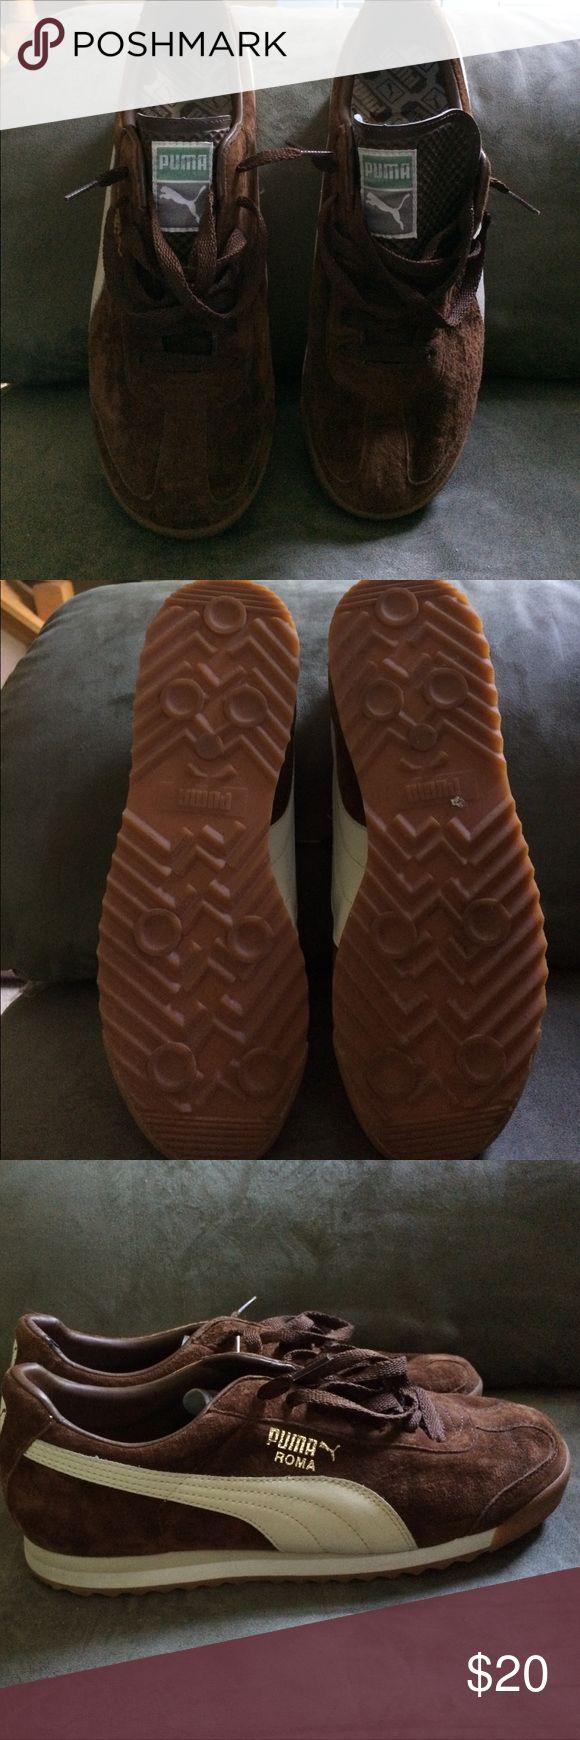 Men Puma sneakers Brown suede lightly worn Puma Shoes Sneakers